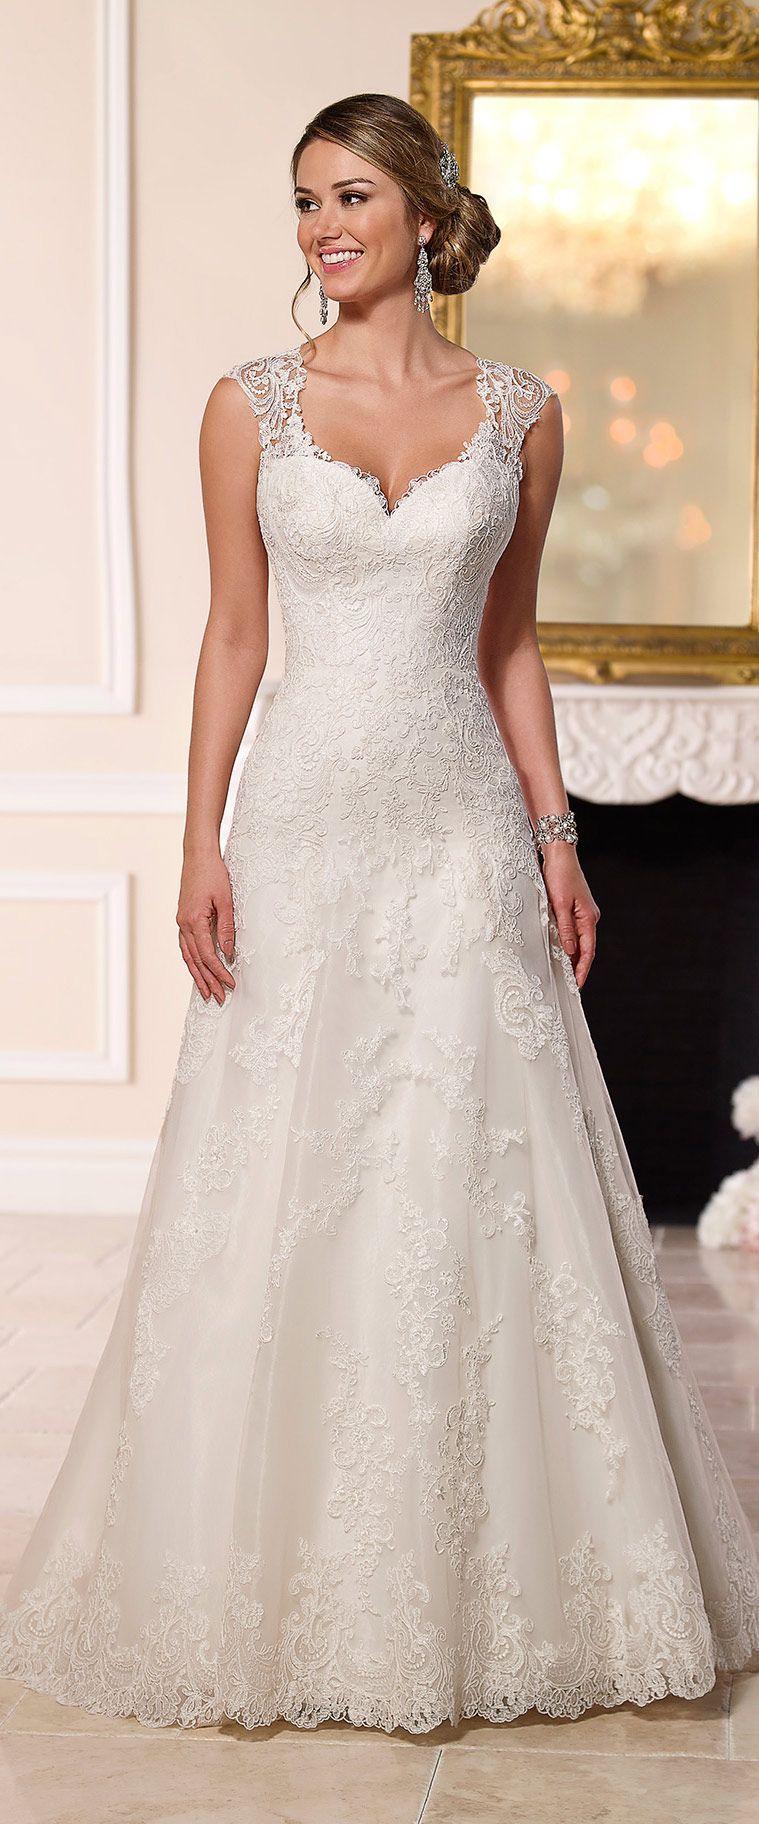 Stella York A Line Lace Wedding Dress 2016 Lace Wedding Dresses In